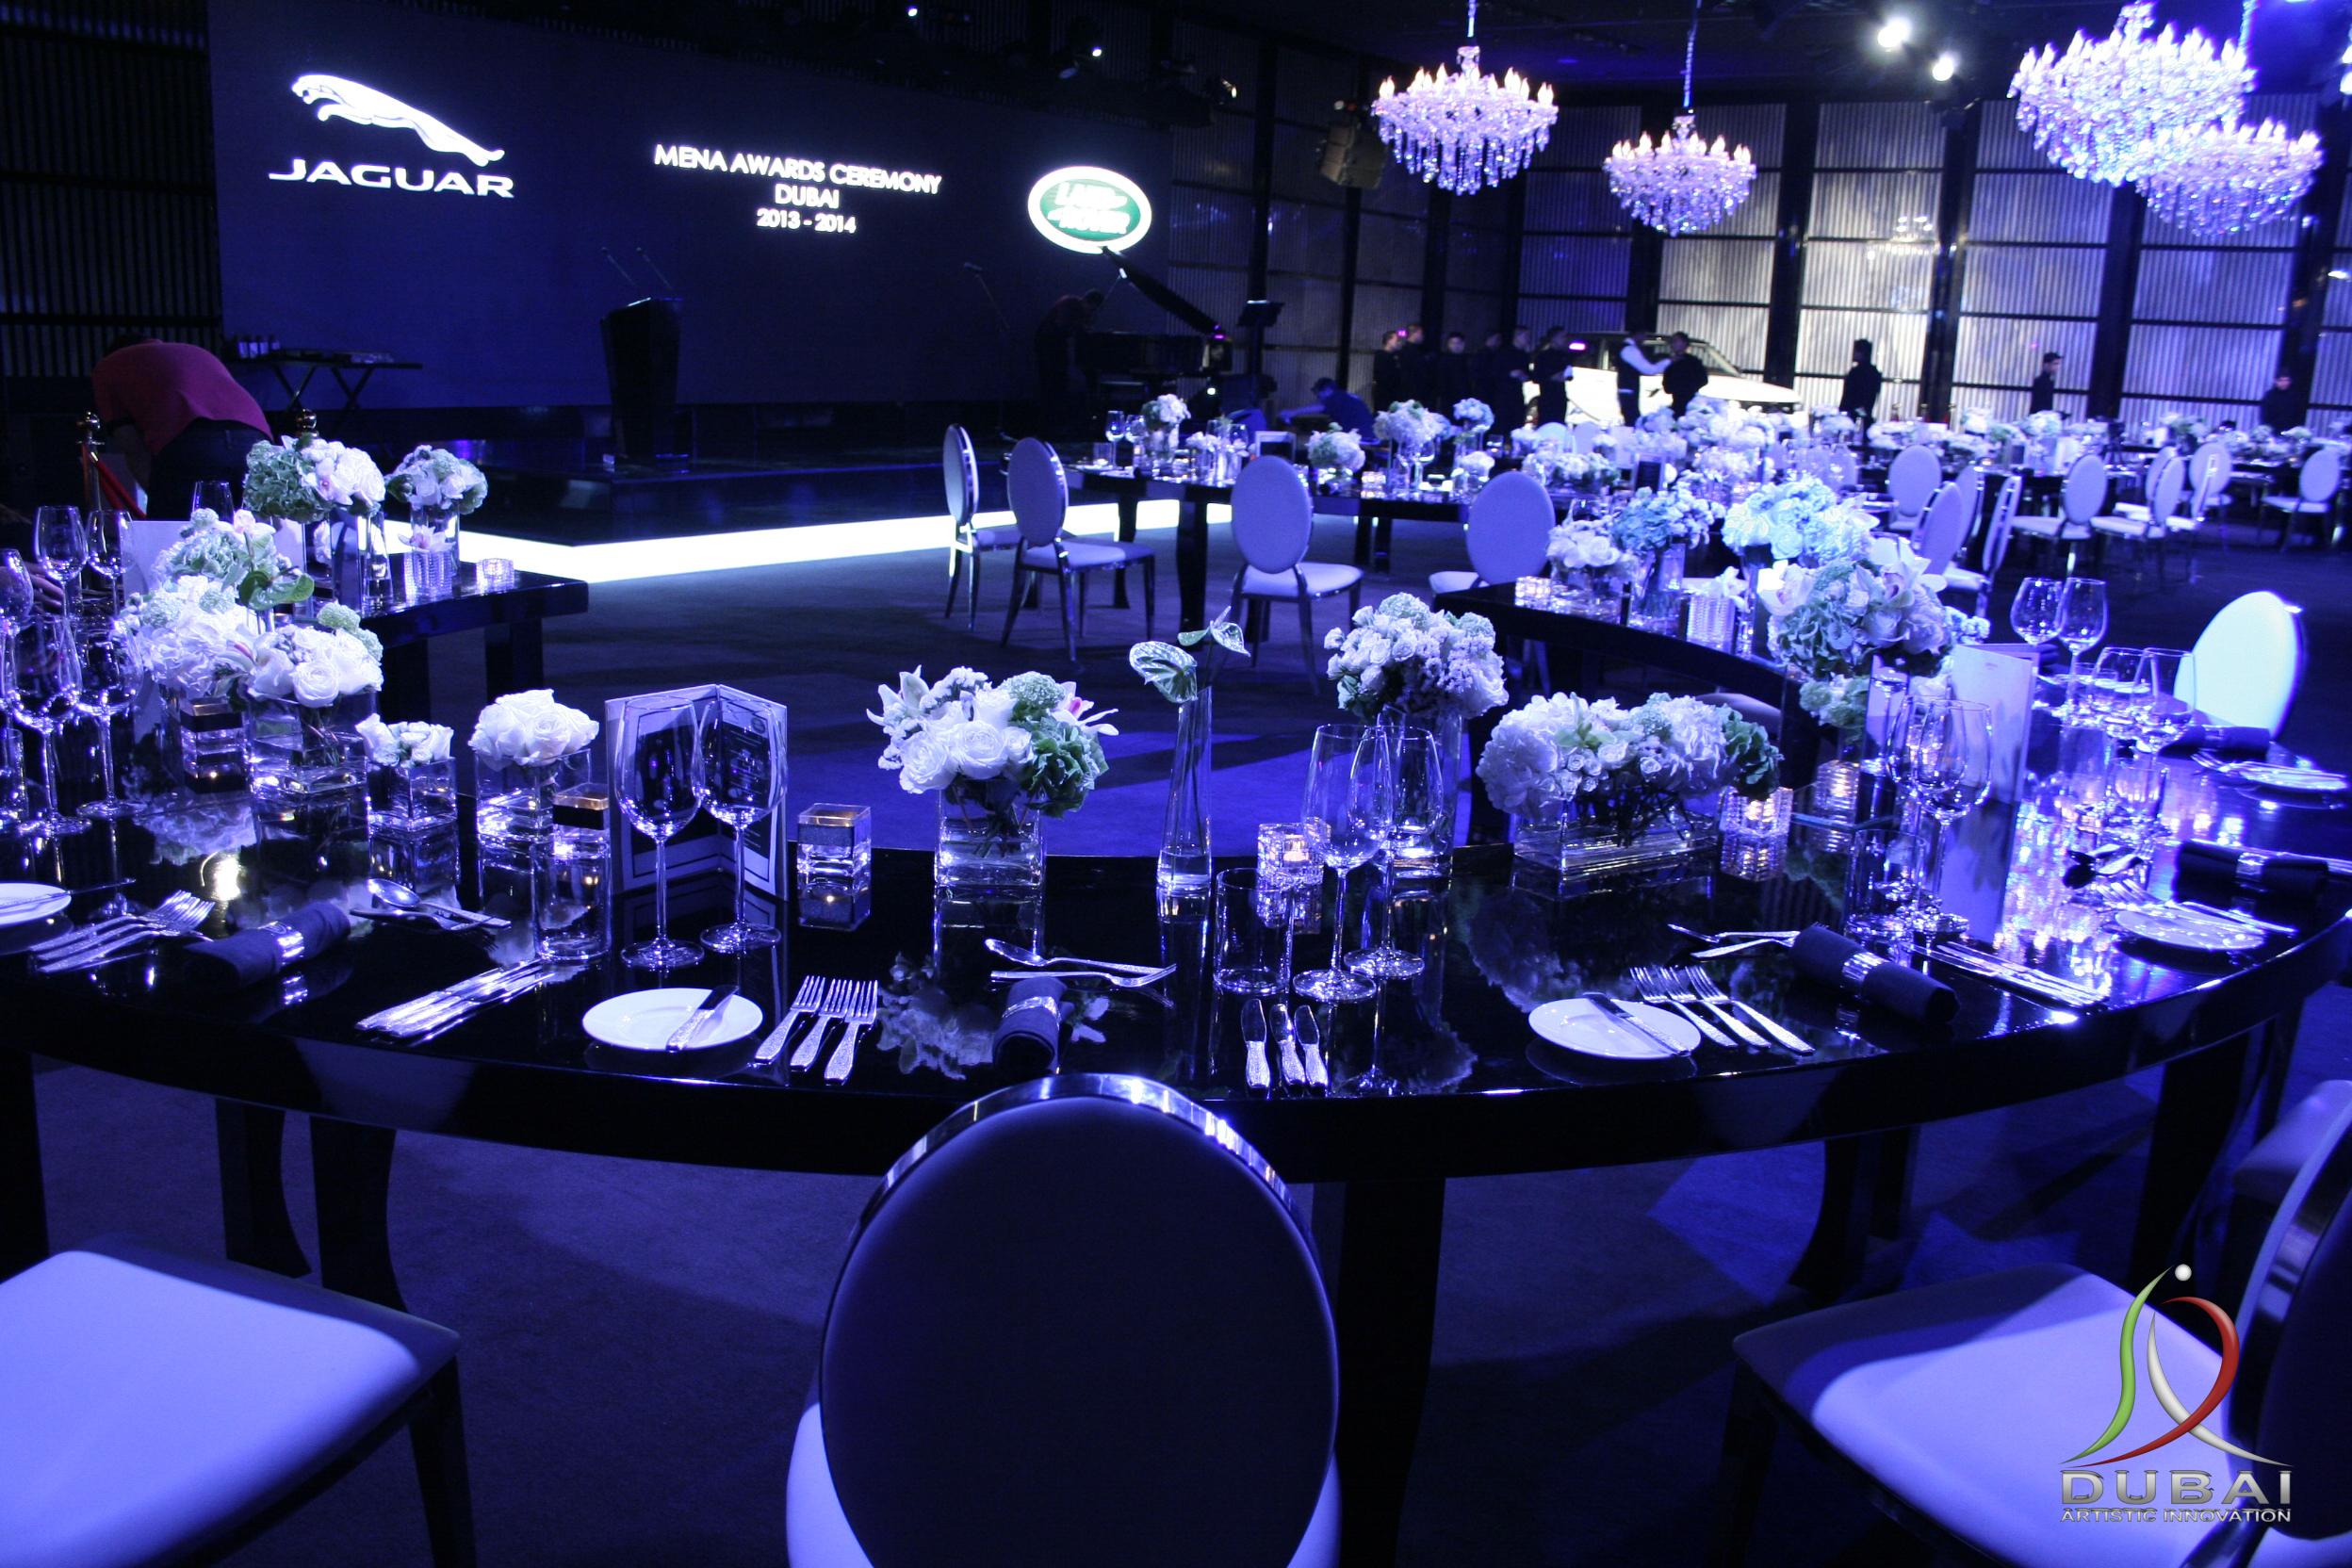 Mena Awards Ceremony 2014